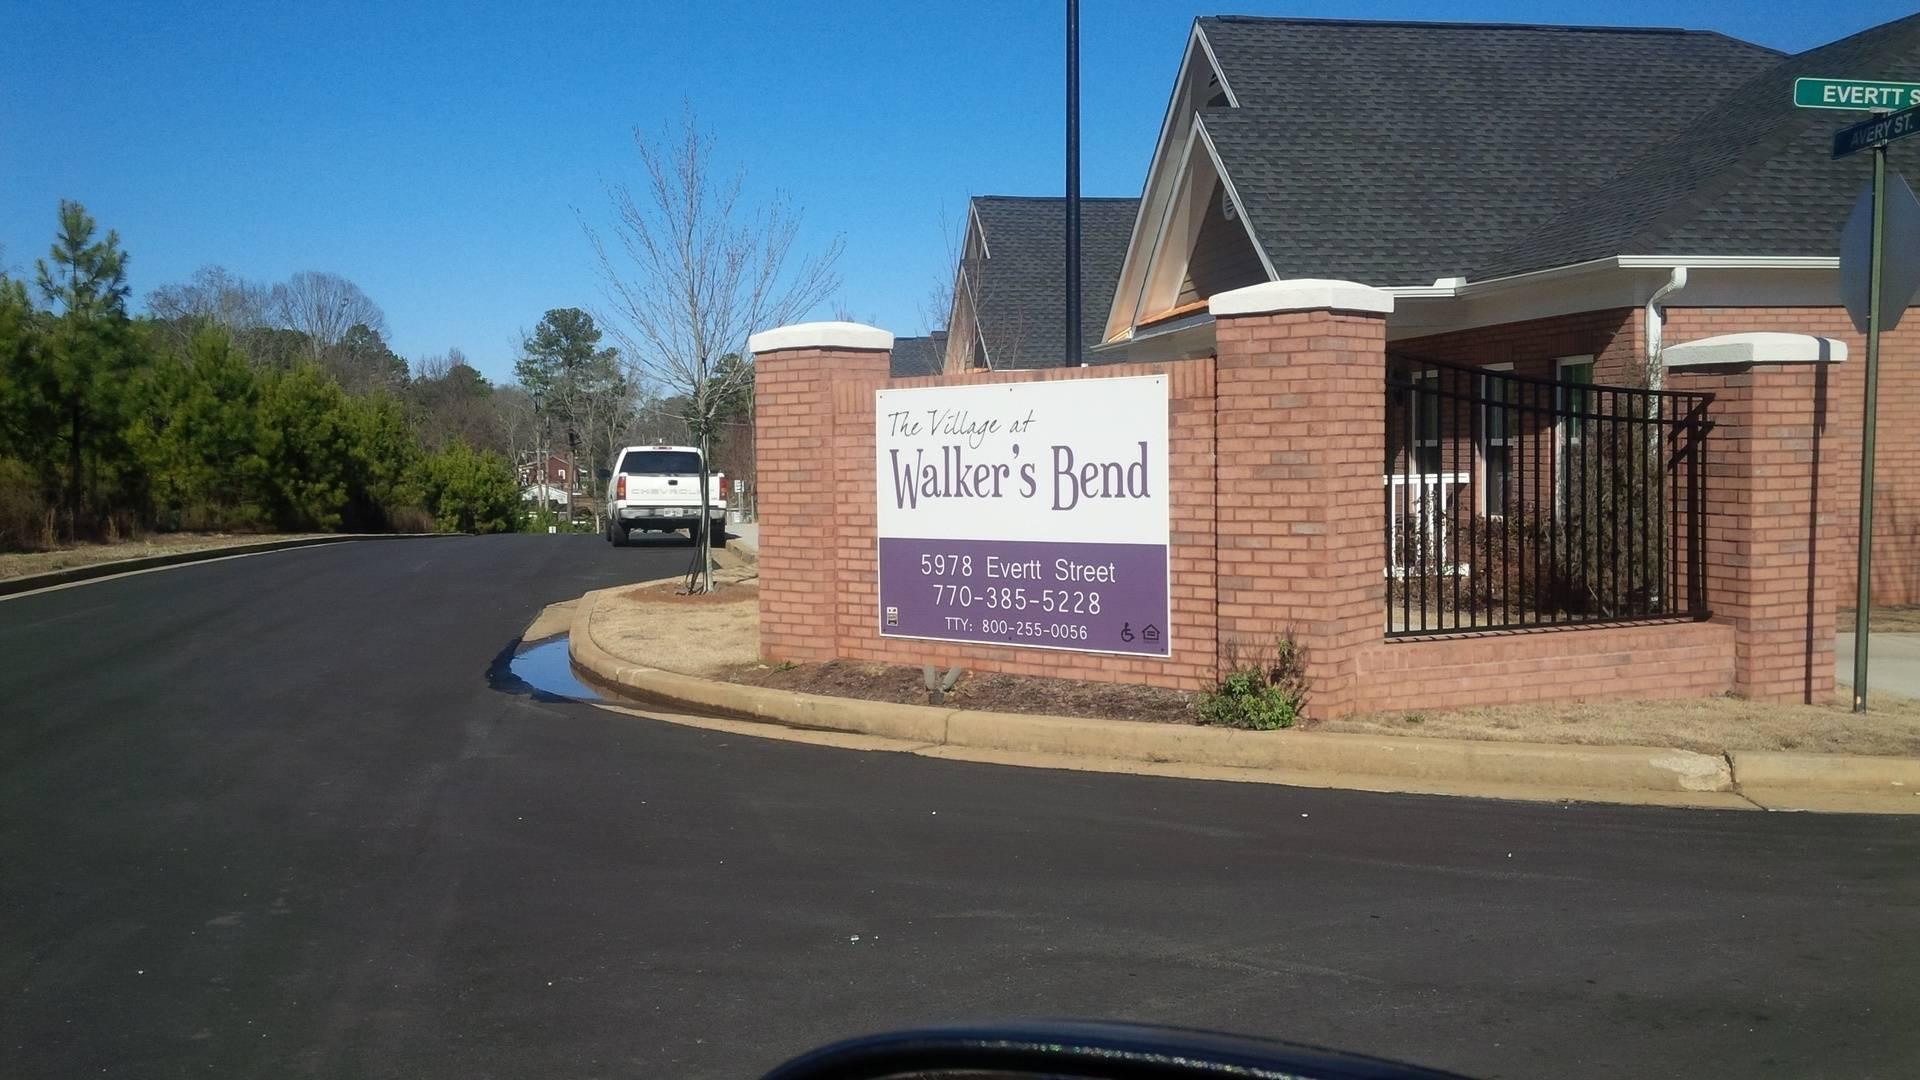 Walkers Bend